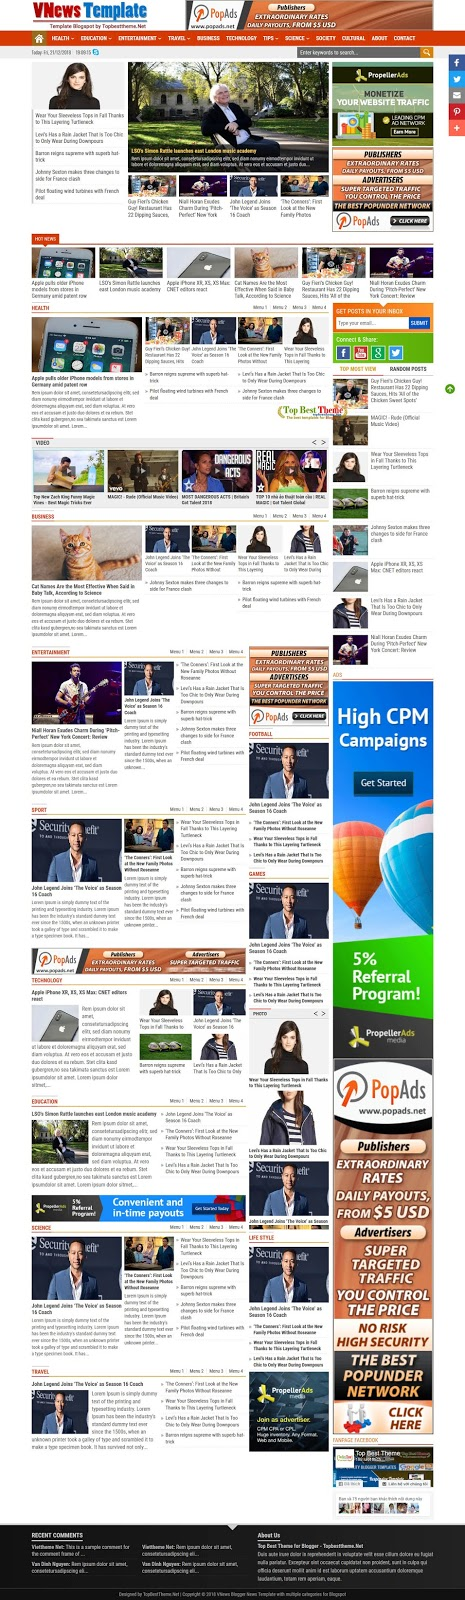 VNews - Blogger News Template